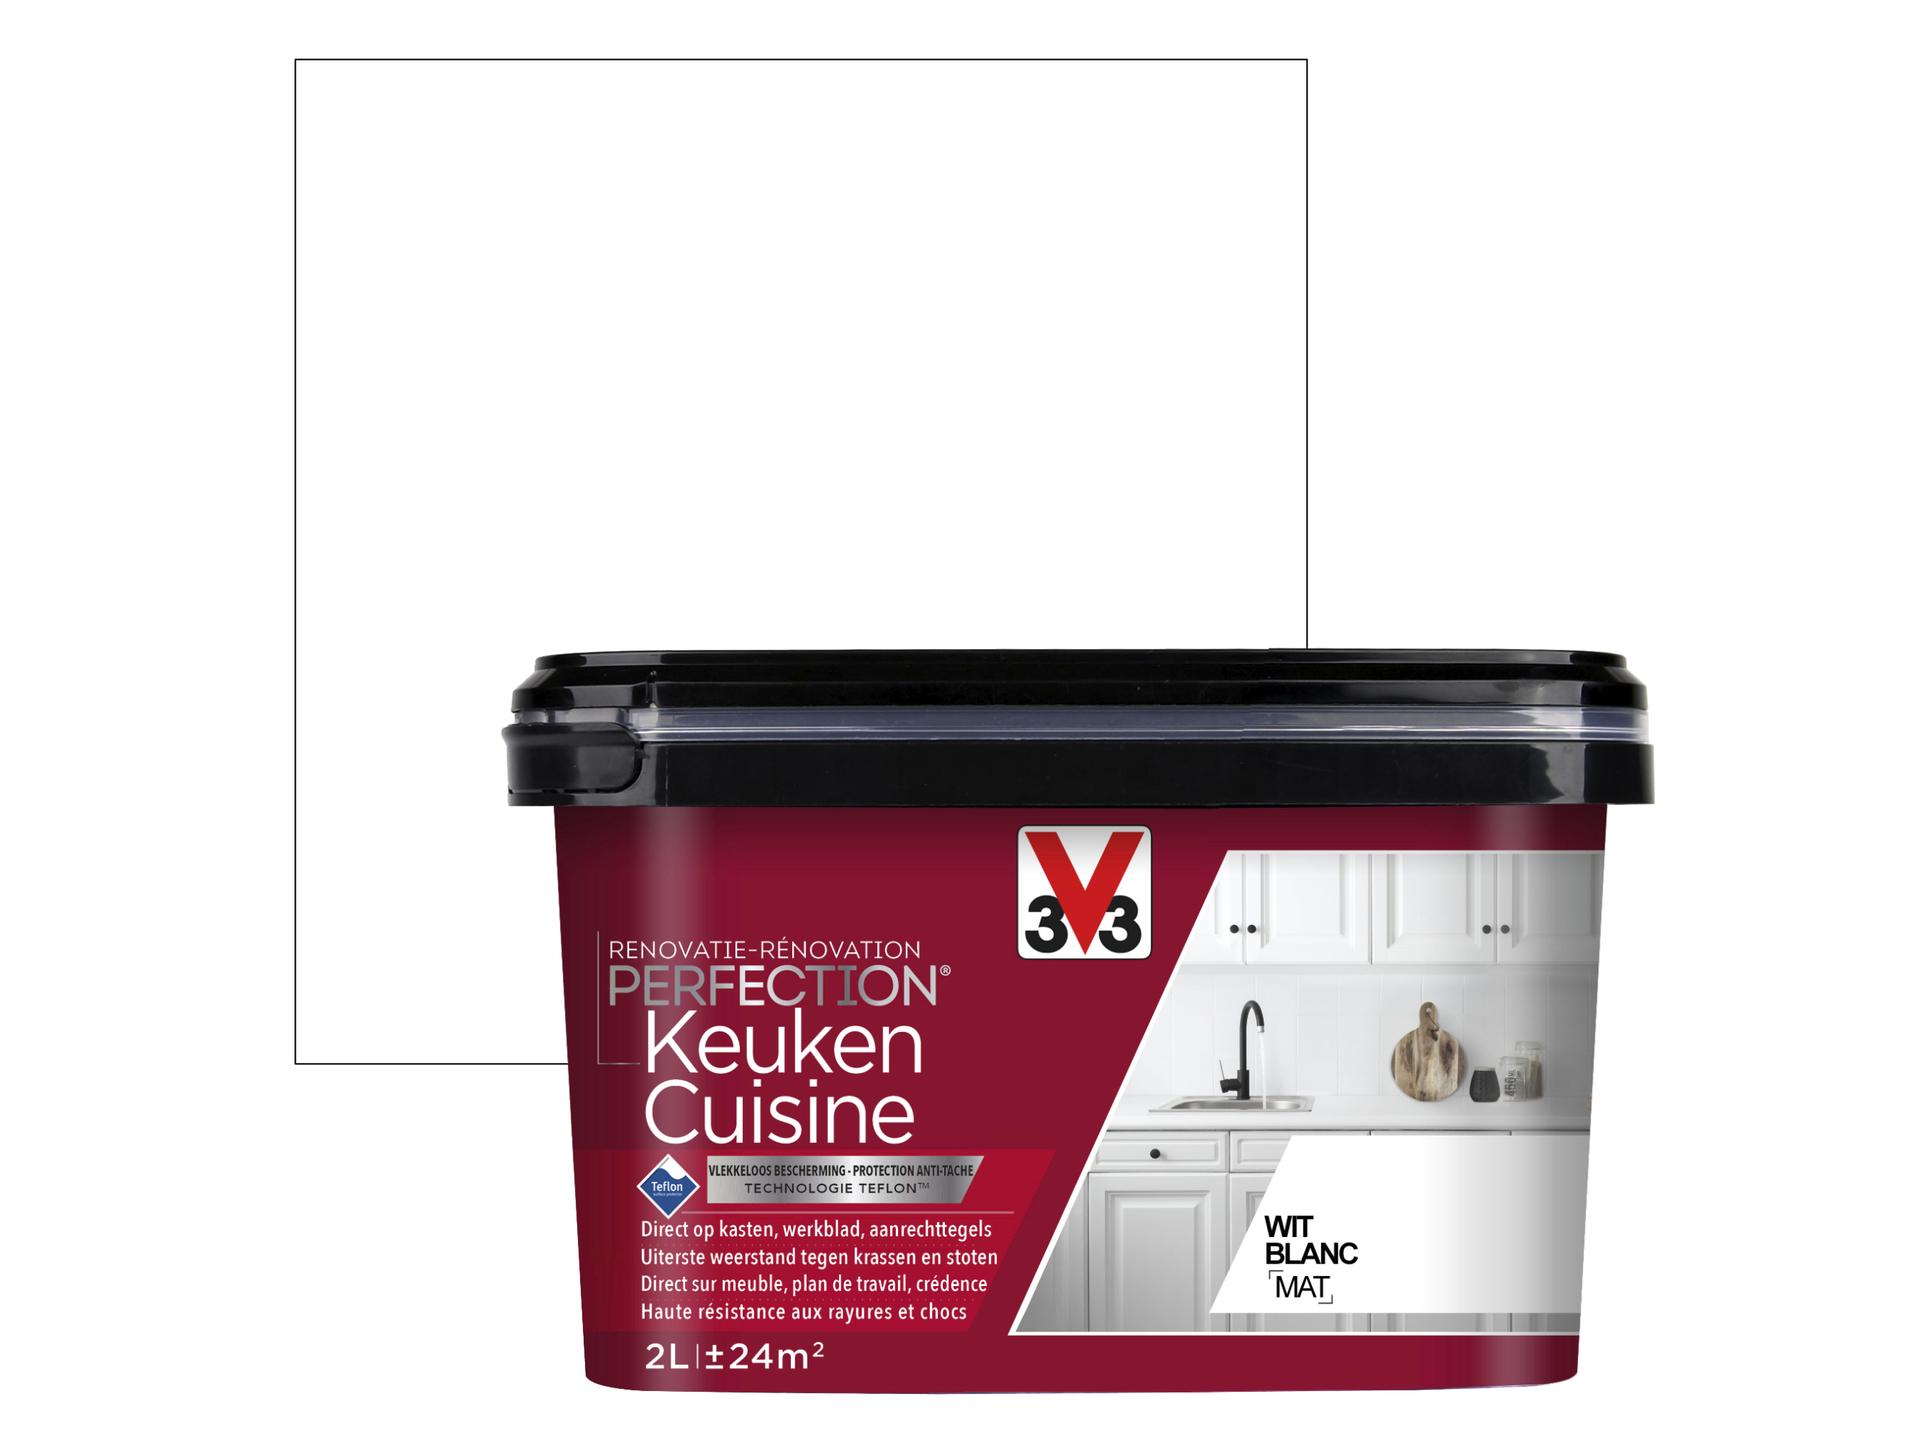 Nettoyer Meuble Cuisine Mat v33 perfection peinture rénovation cuisine mat 2l blanc